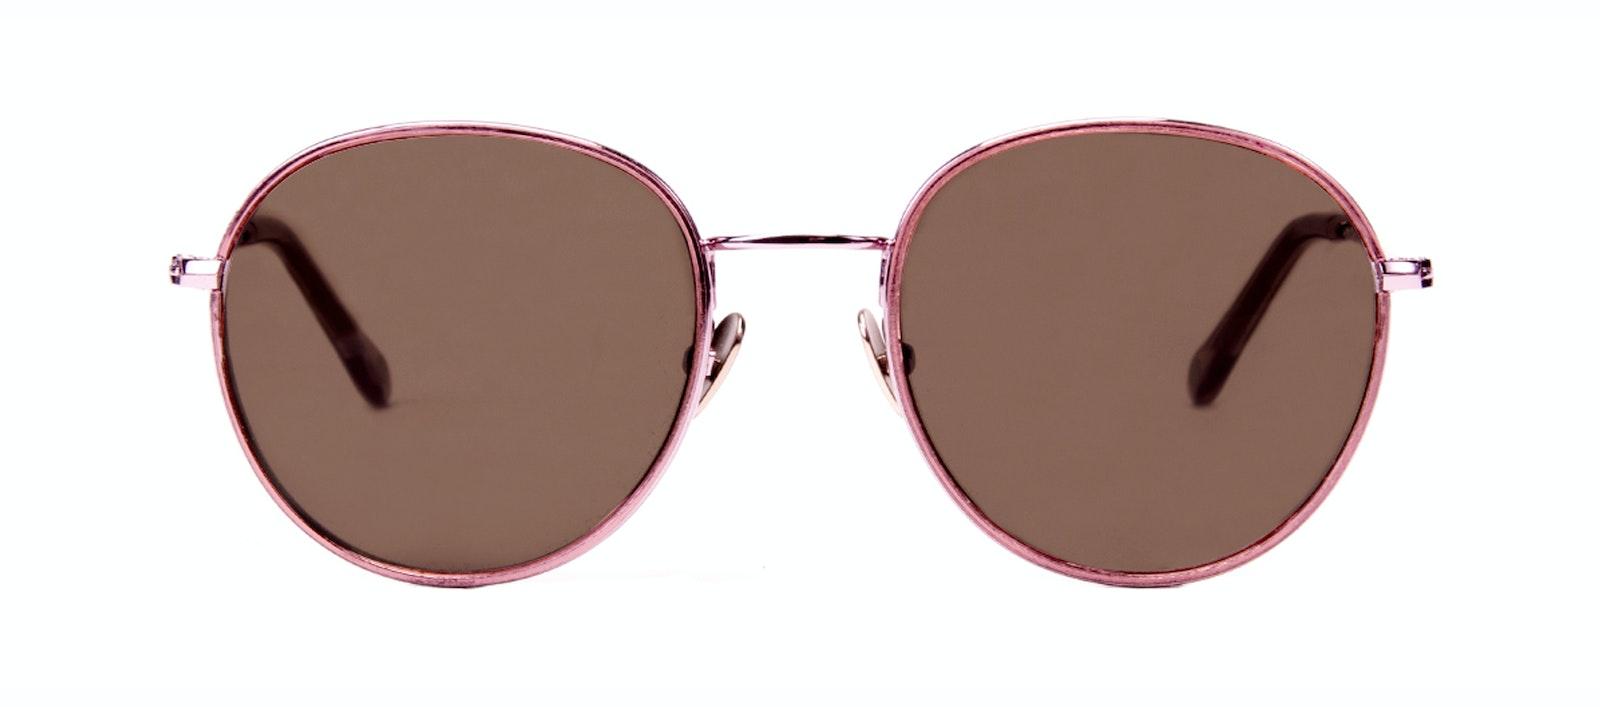 Affordable Fashion Glasses Aviator Round Sunglasses Women Subrosa Romance Front